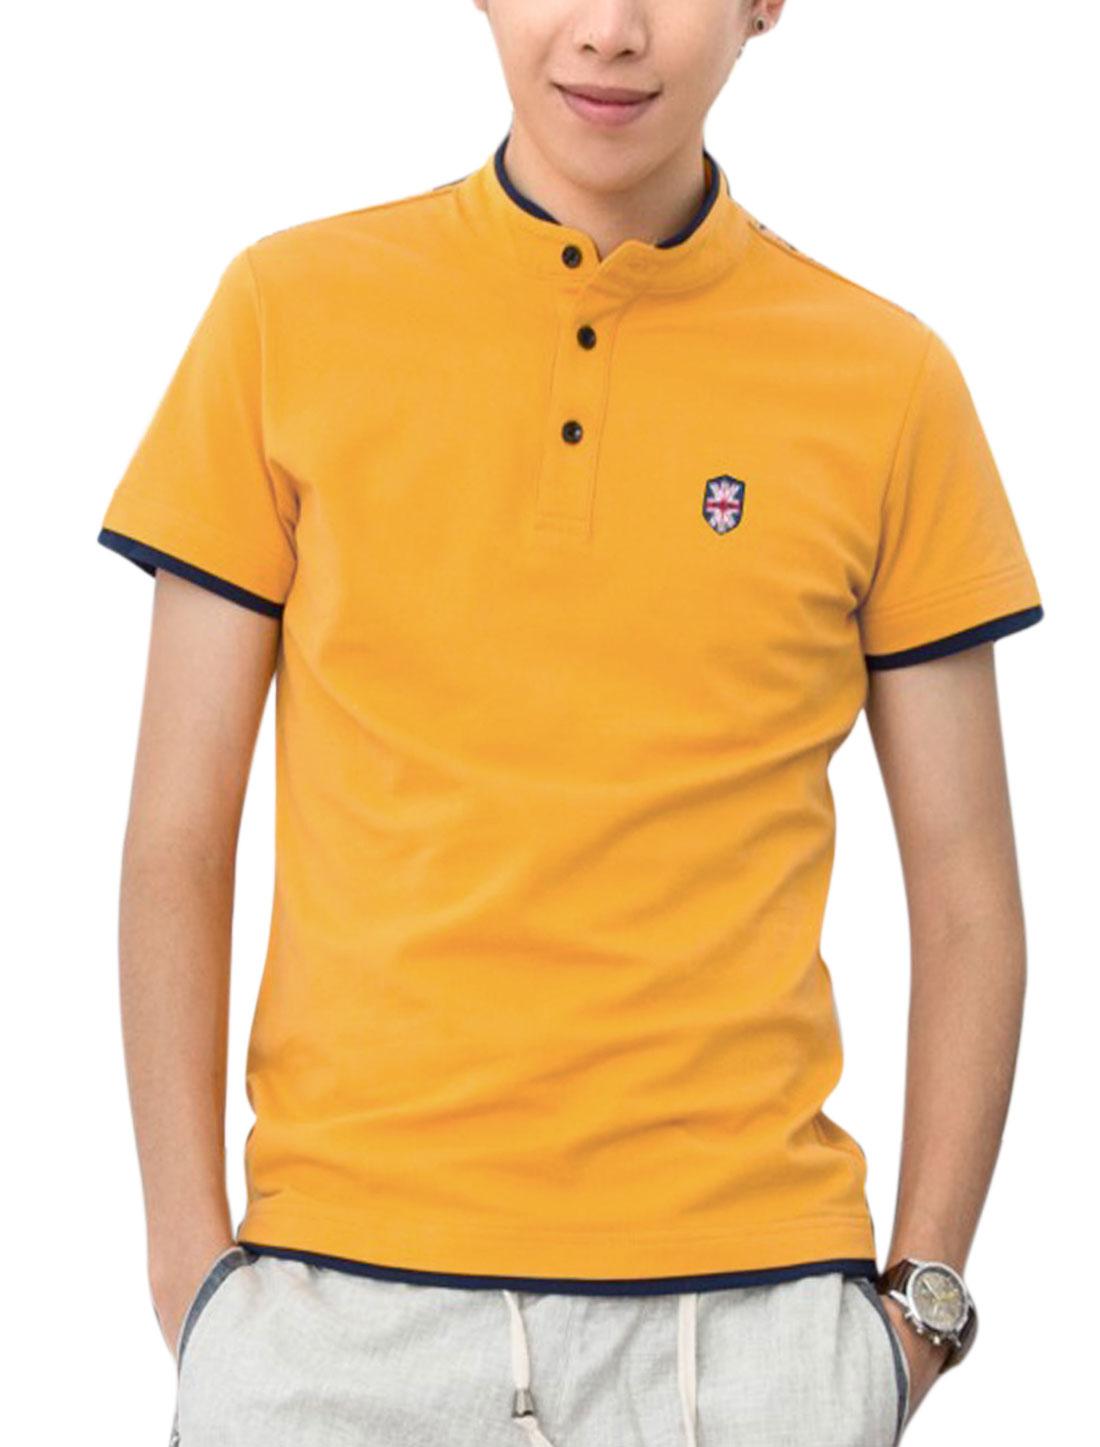 Men 1/4 Placket The Union Flag Applique Trendy Polo Shirt Yellow M